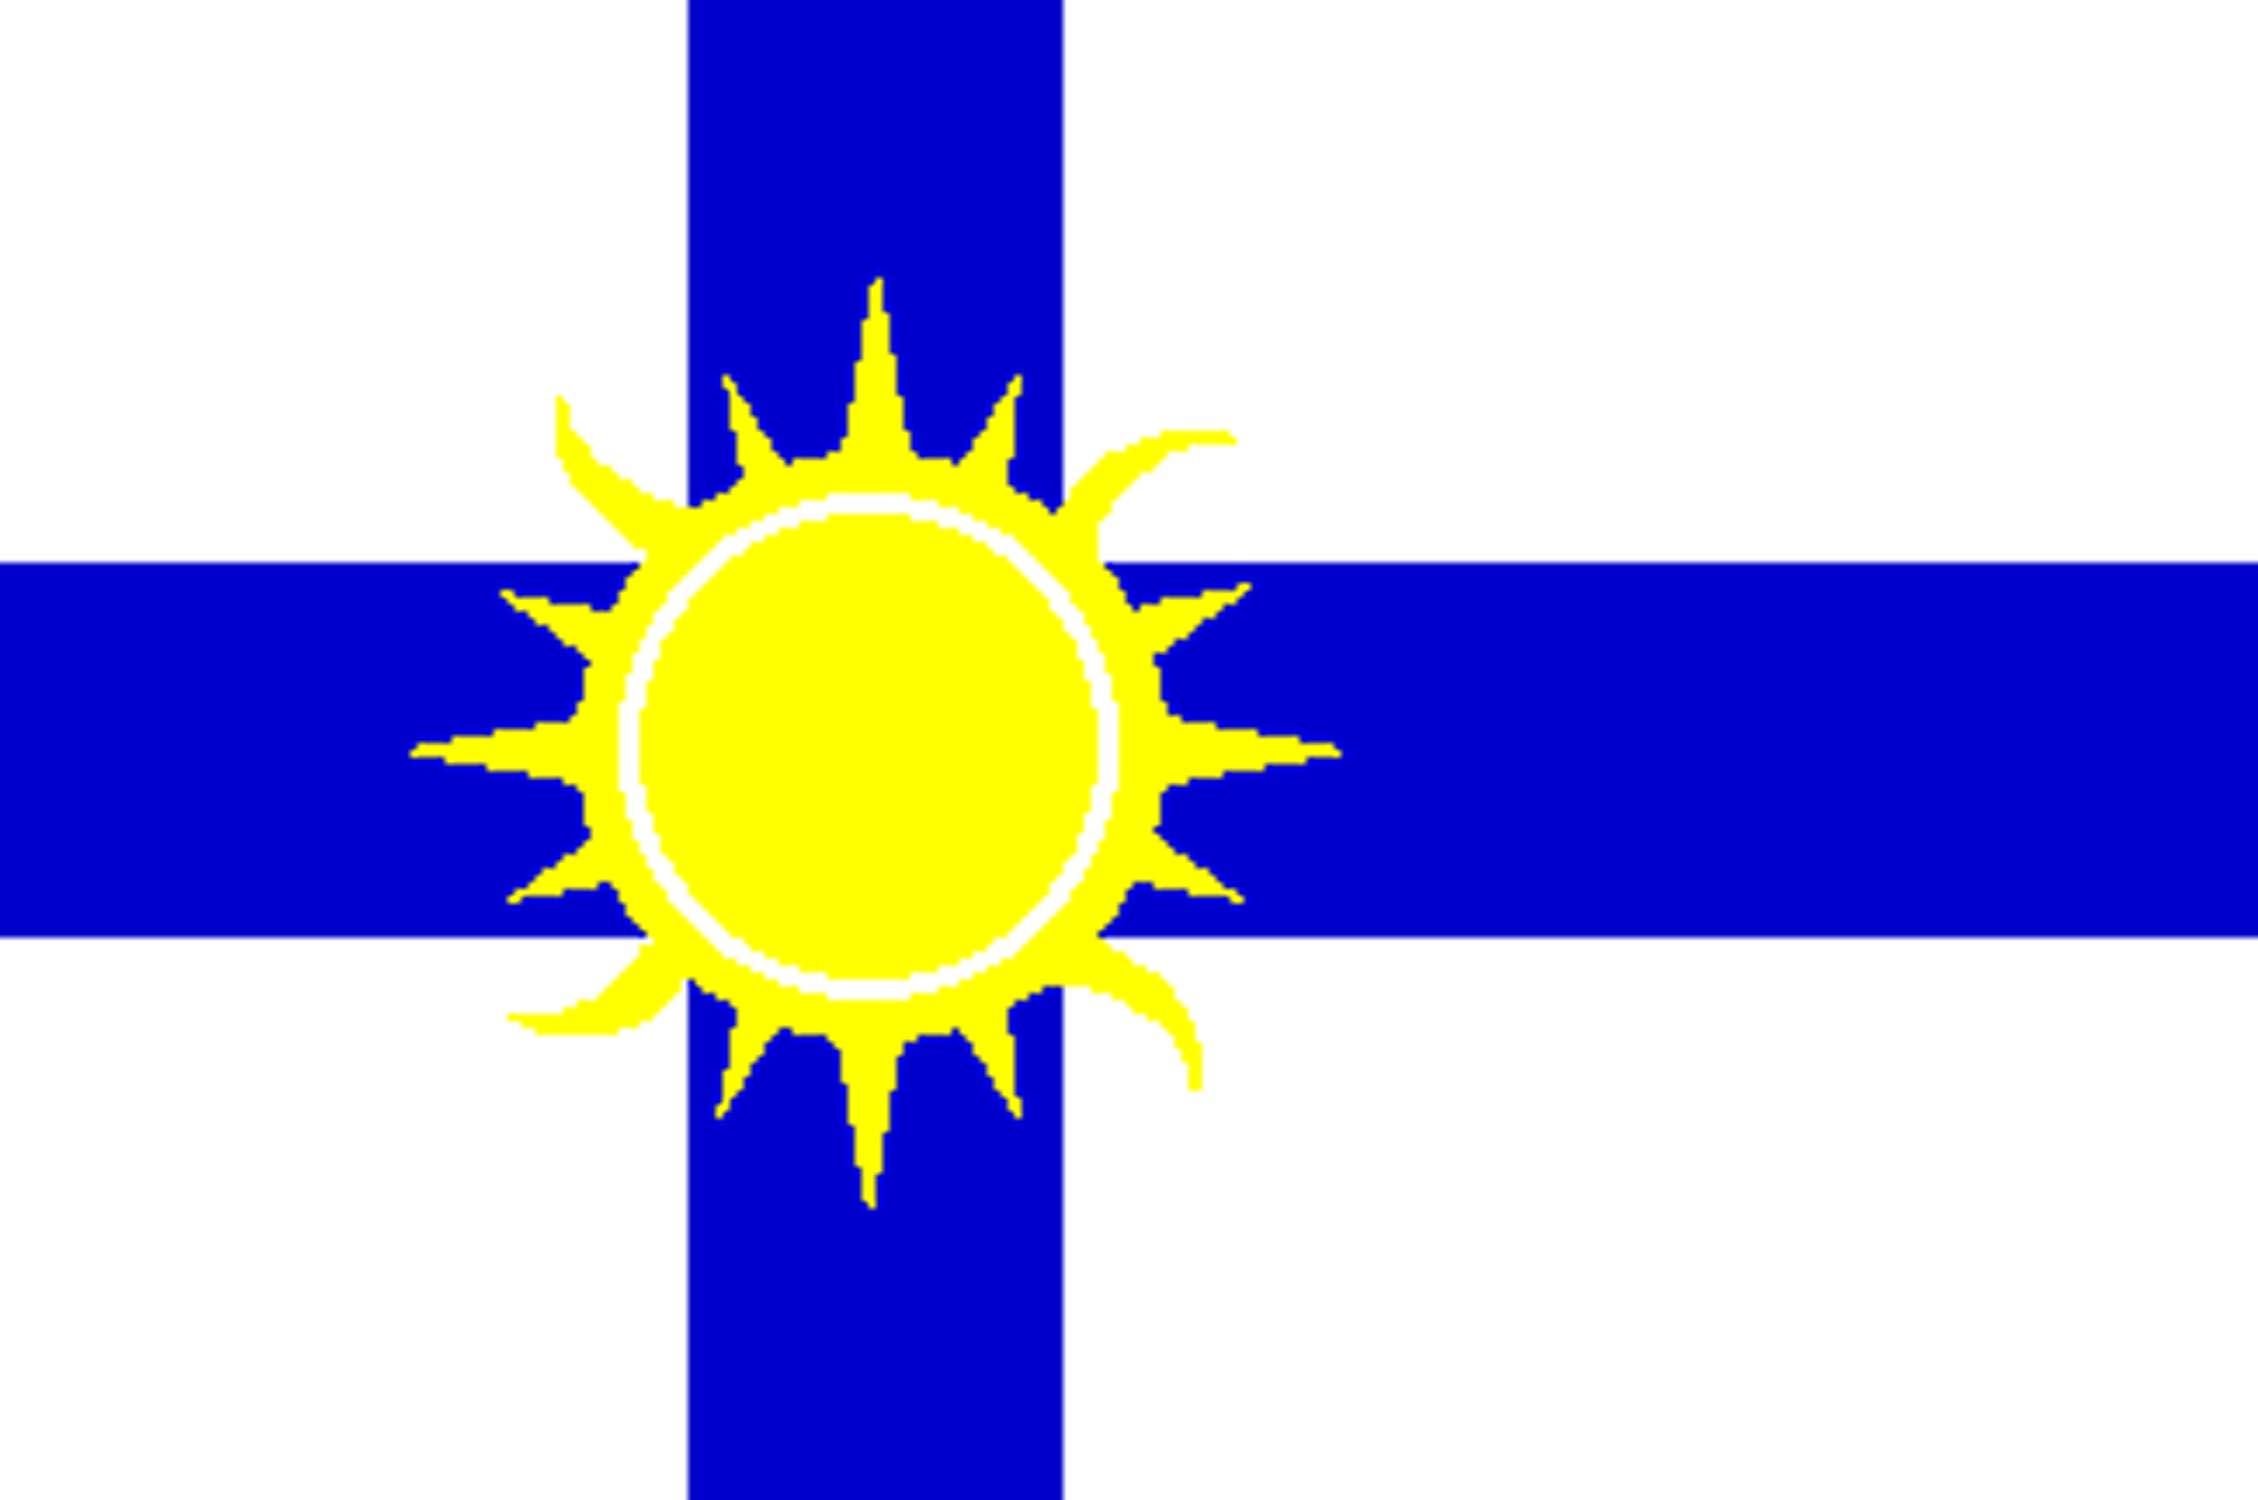 Le drapeau de la RLF